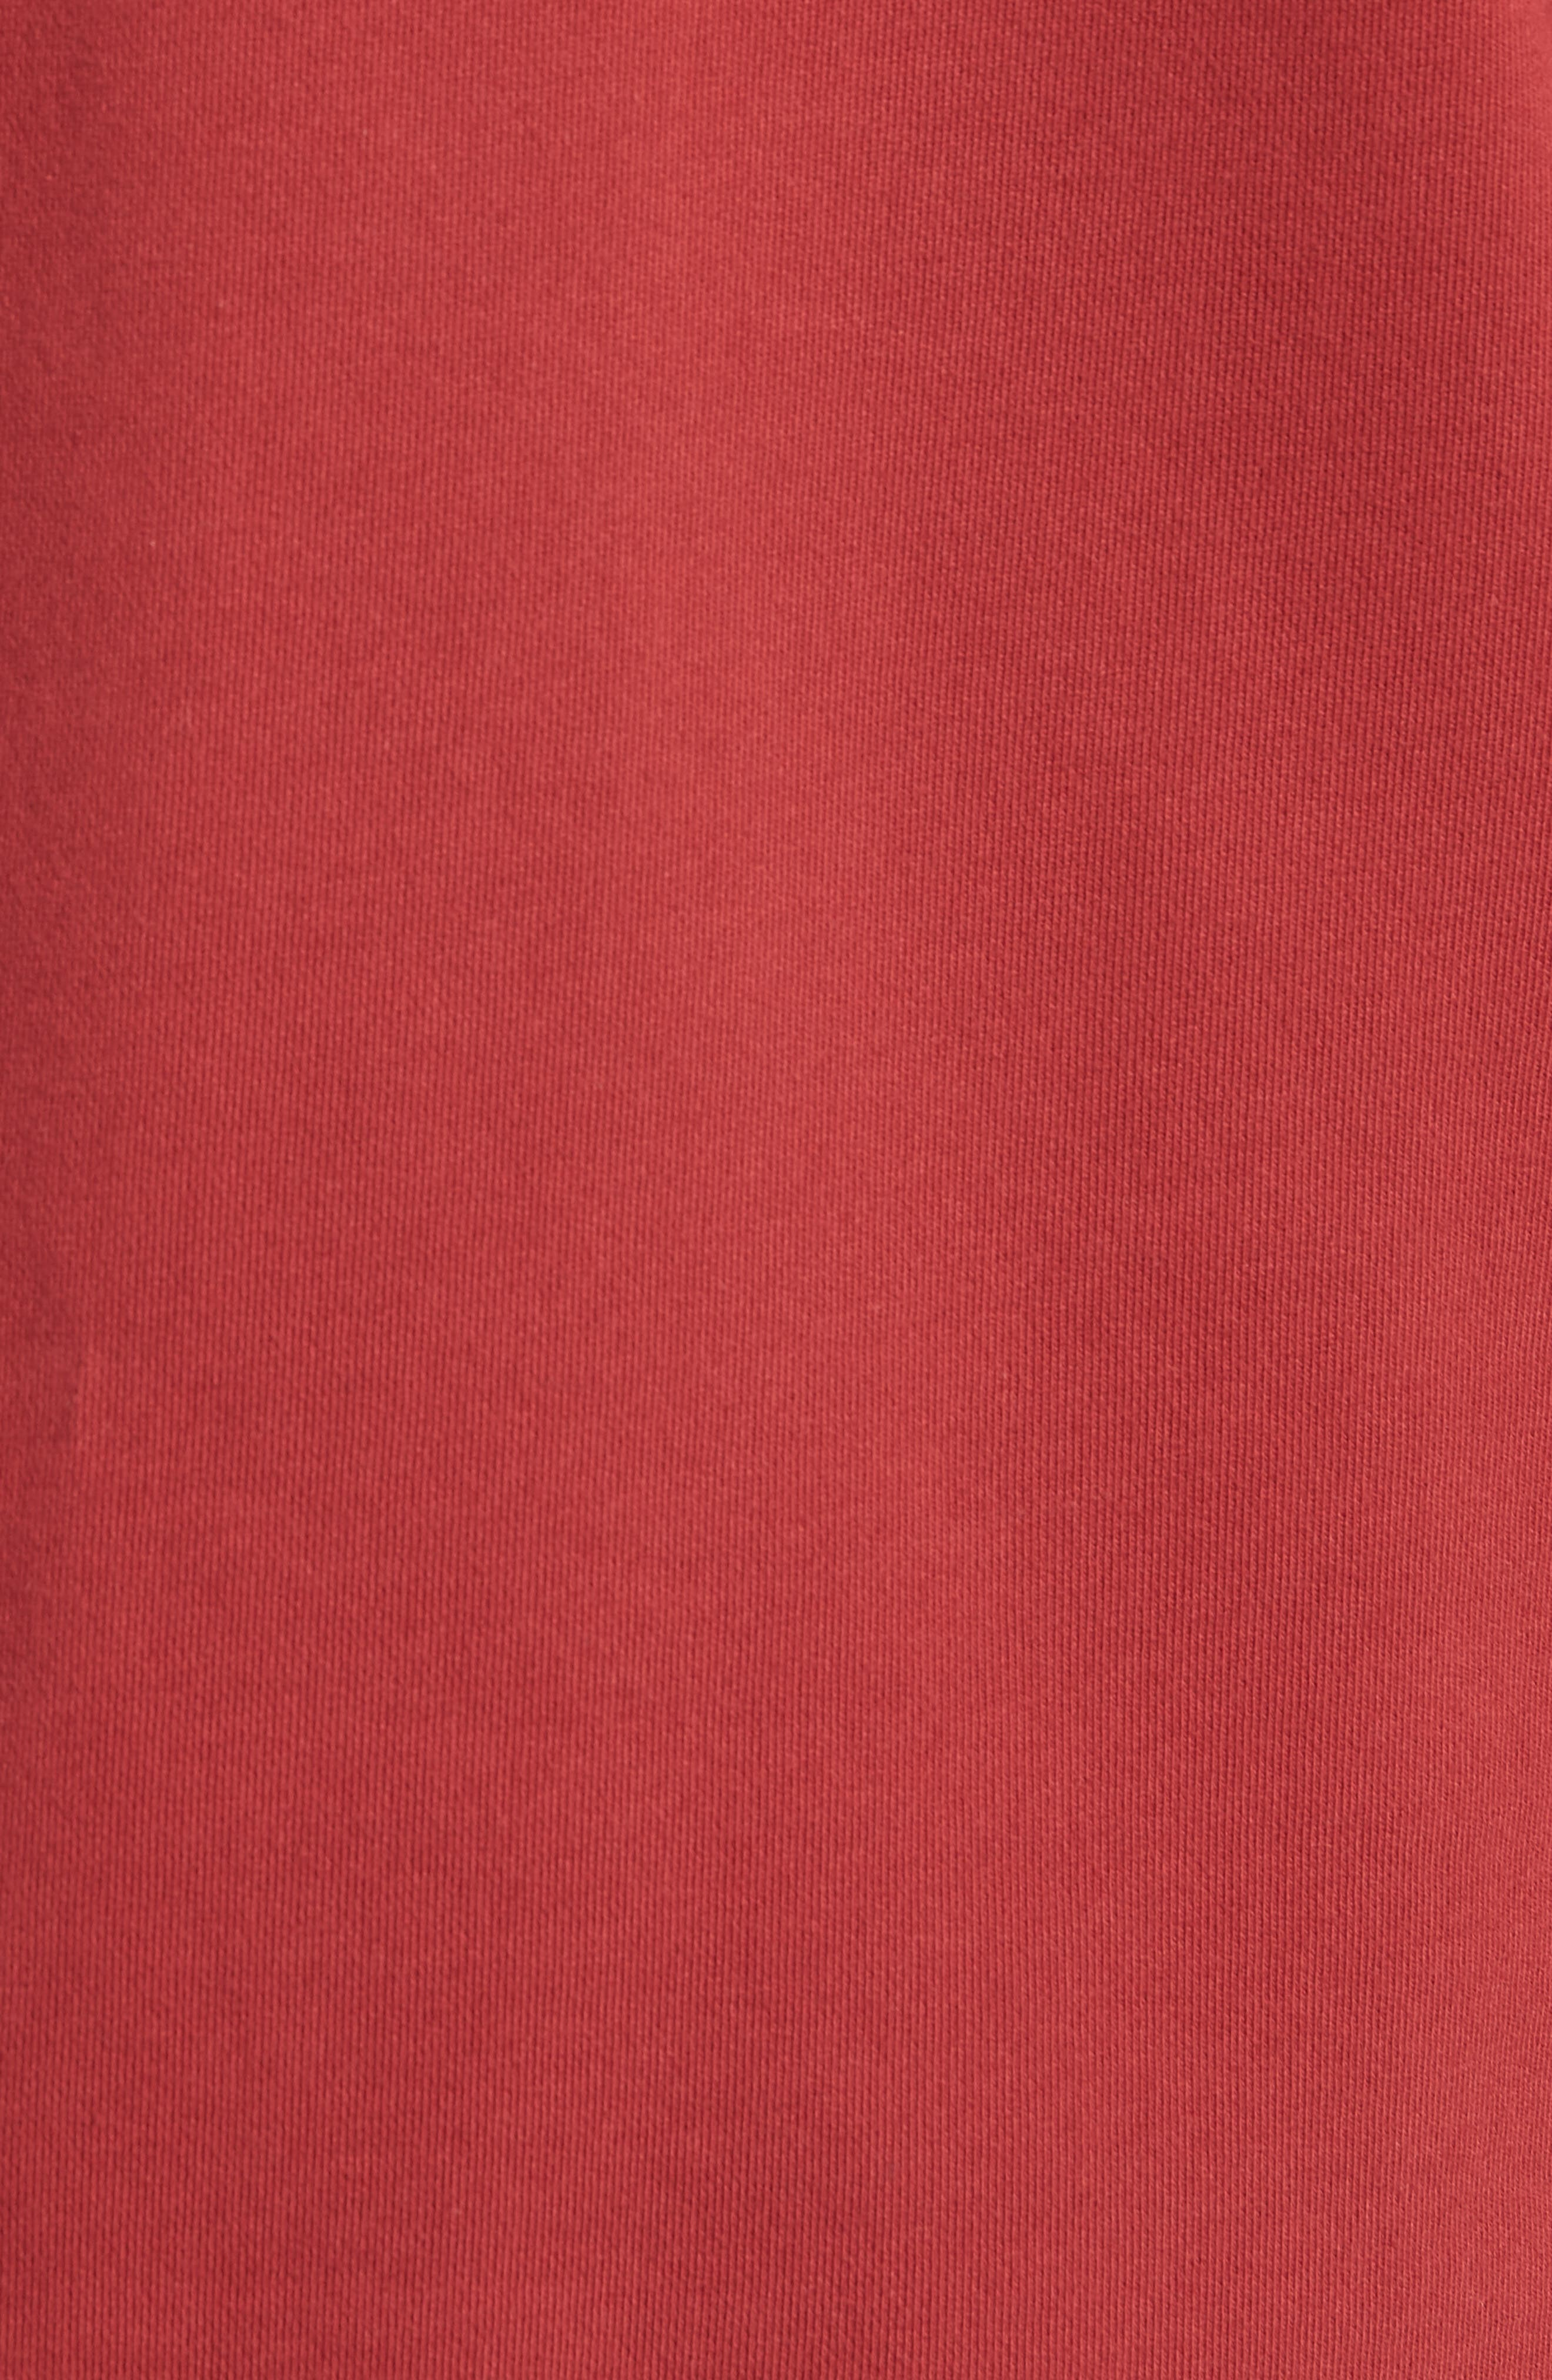 Rugger Hooded Sweatshirt,                             Alternate thumbnail 5, color,                             Dark Cherry